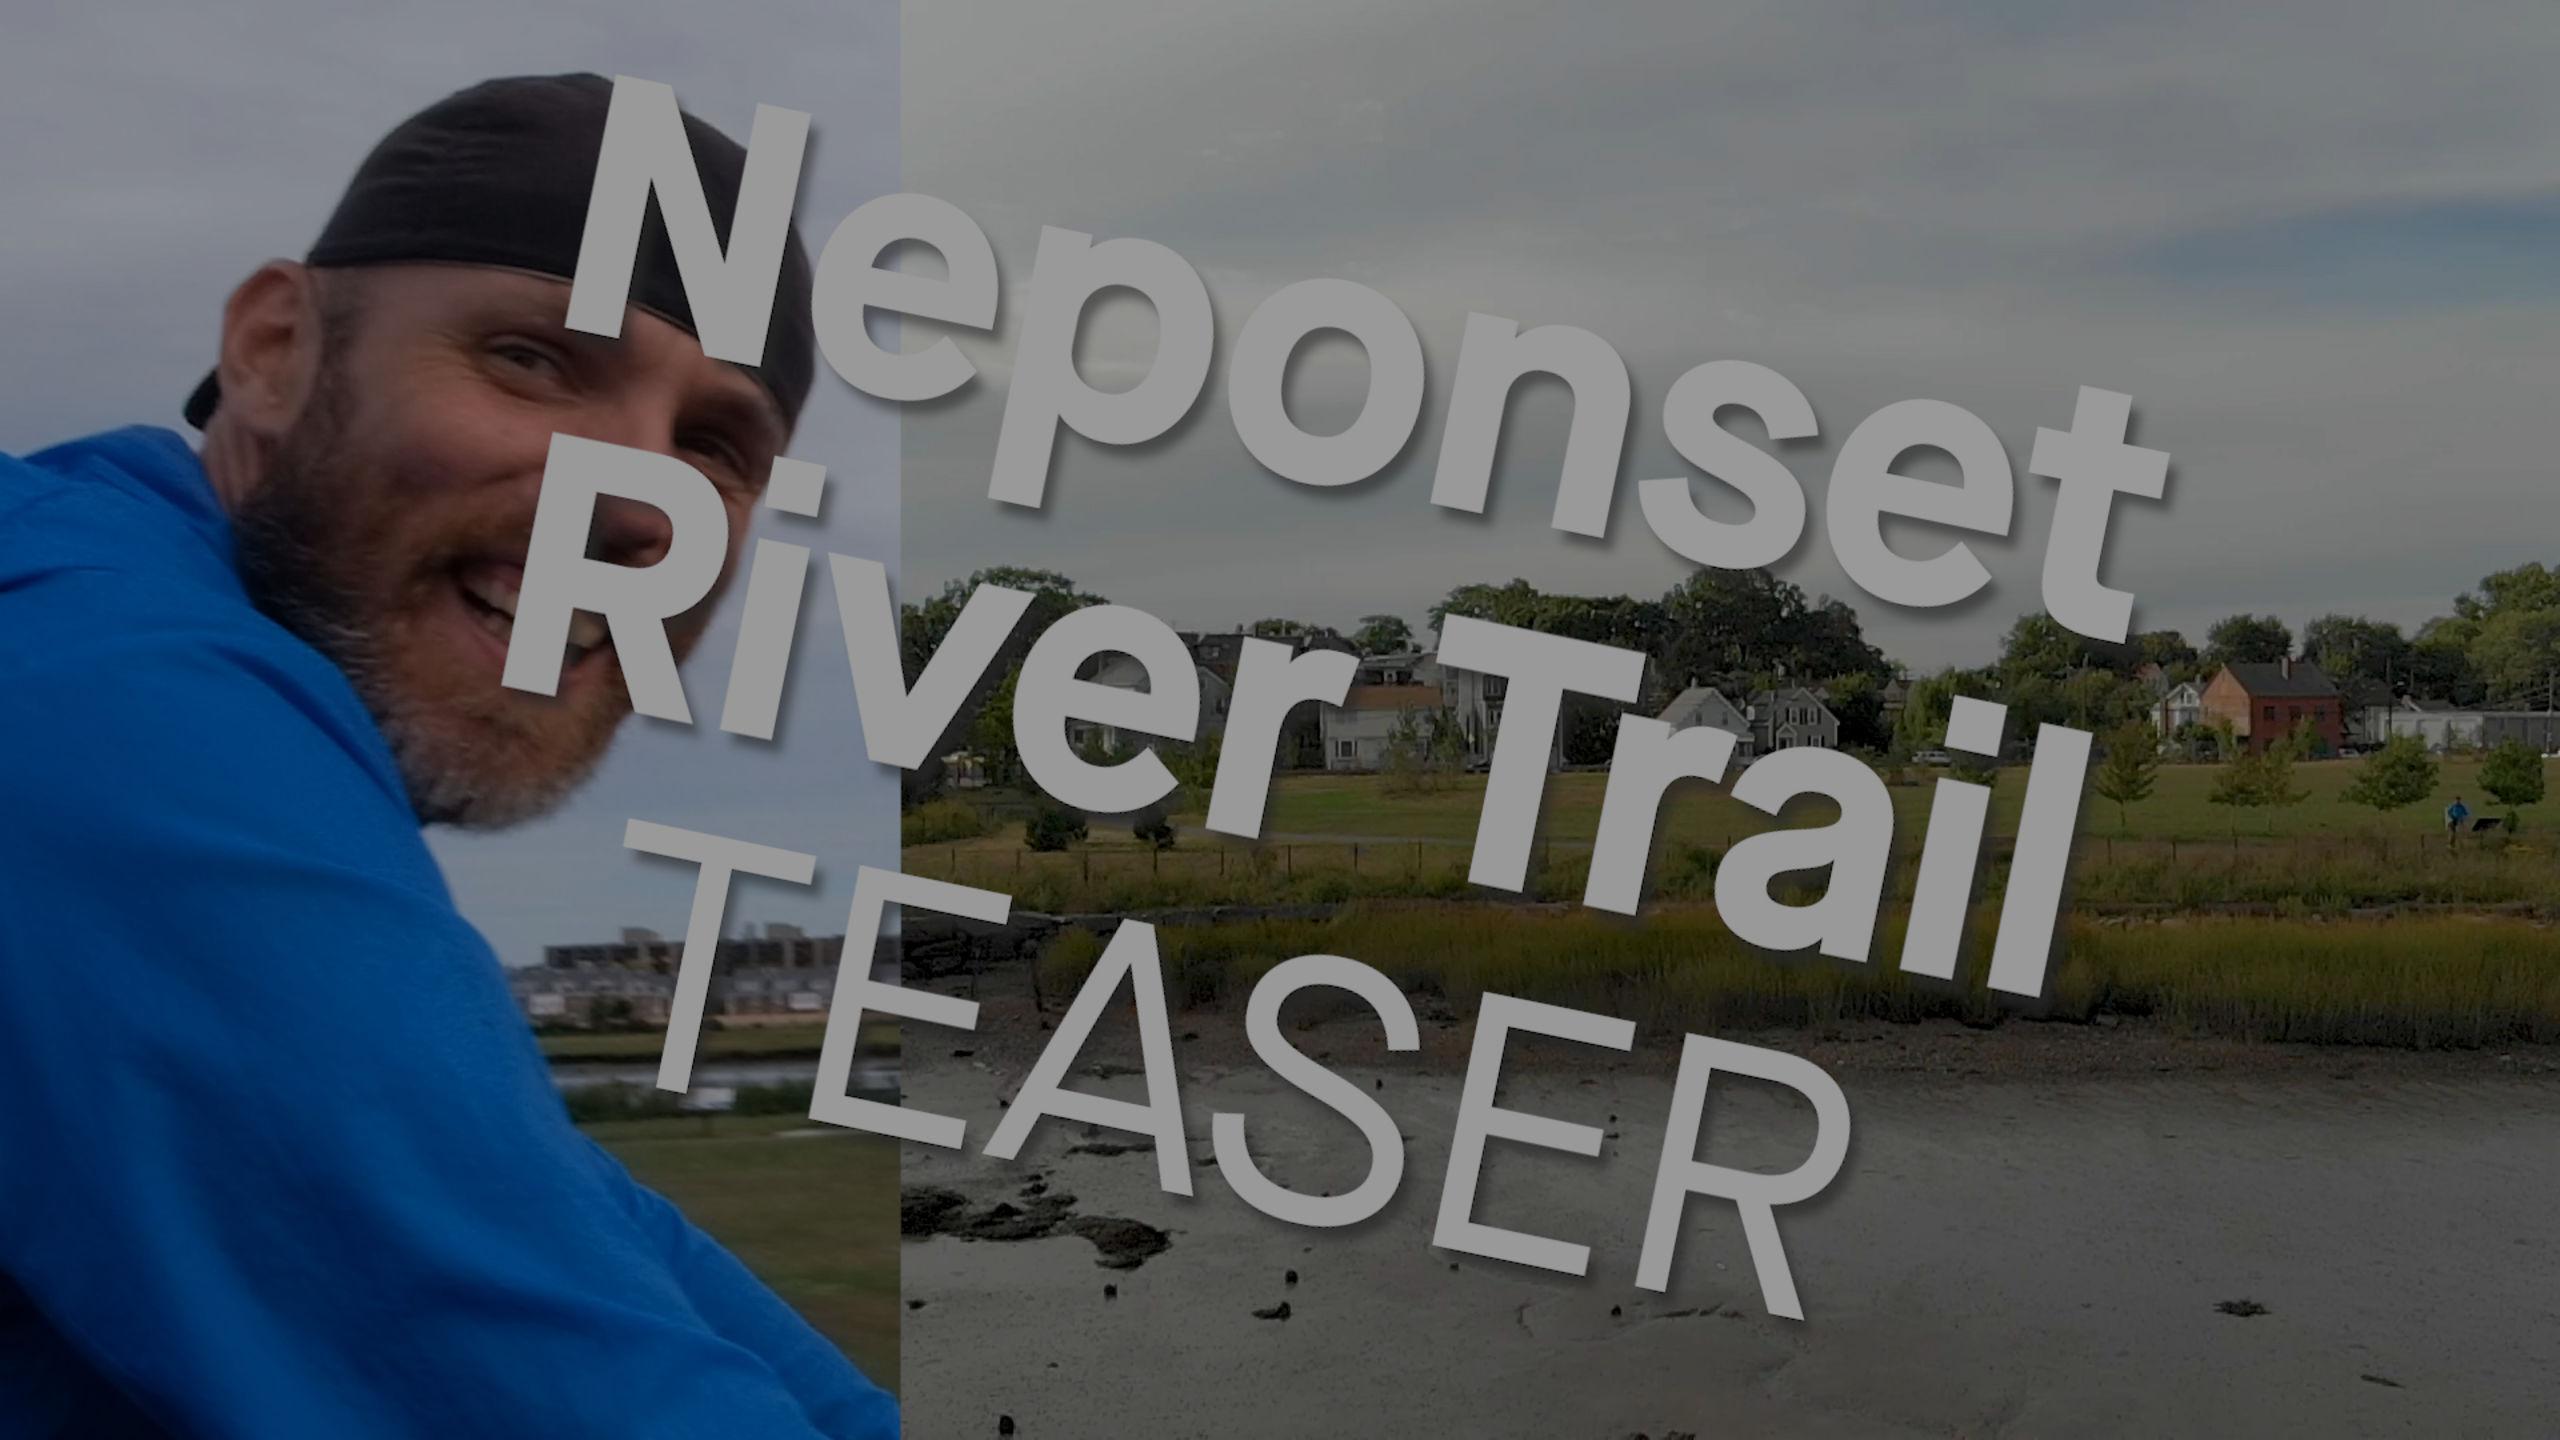 Neponset River Trail -TEASER